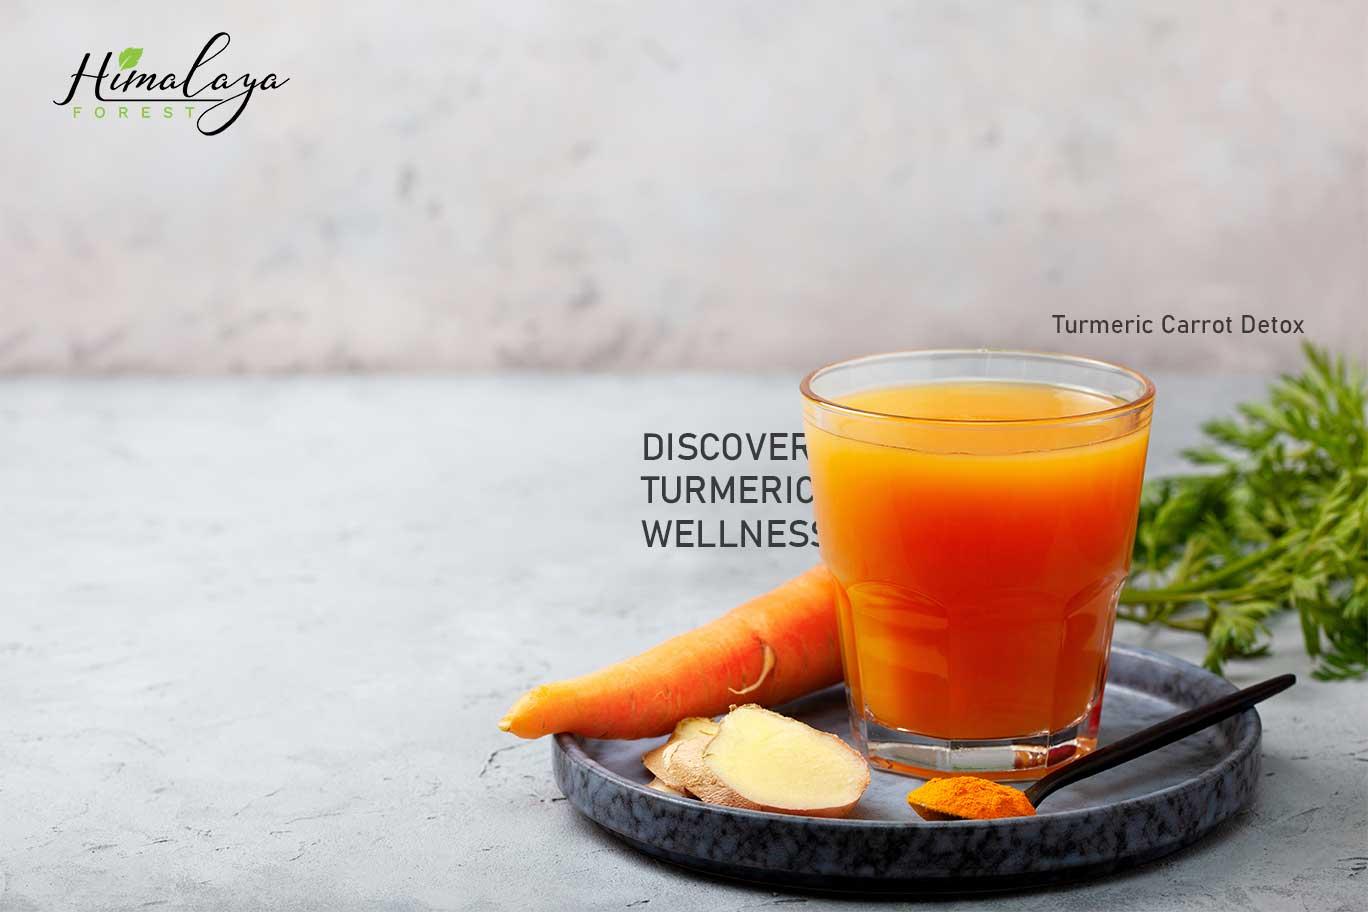 Turmeric Carrot Detox Himalaya Forest